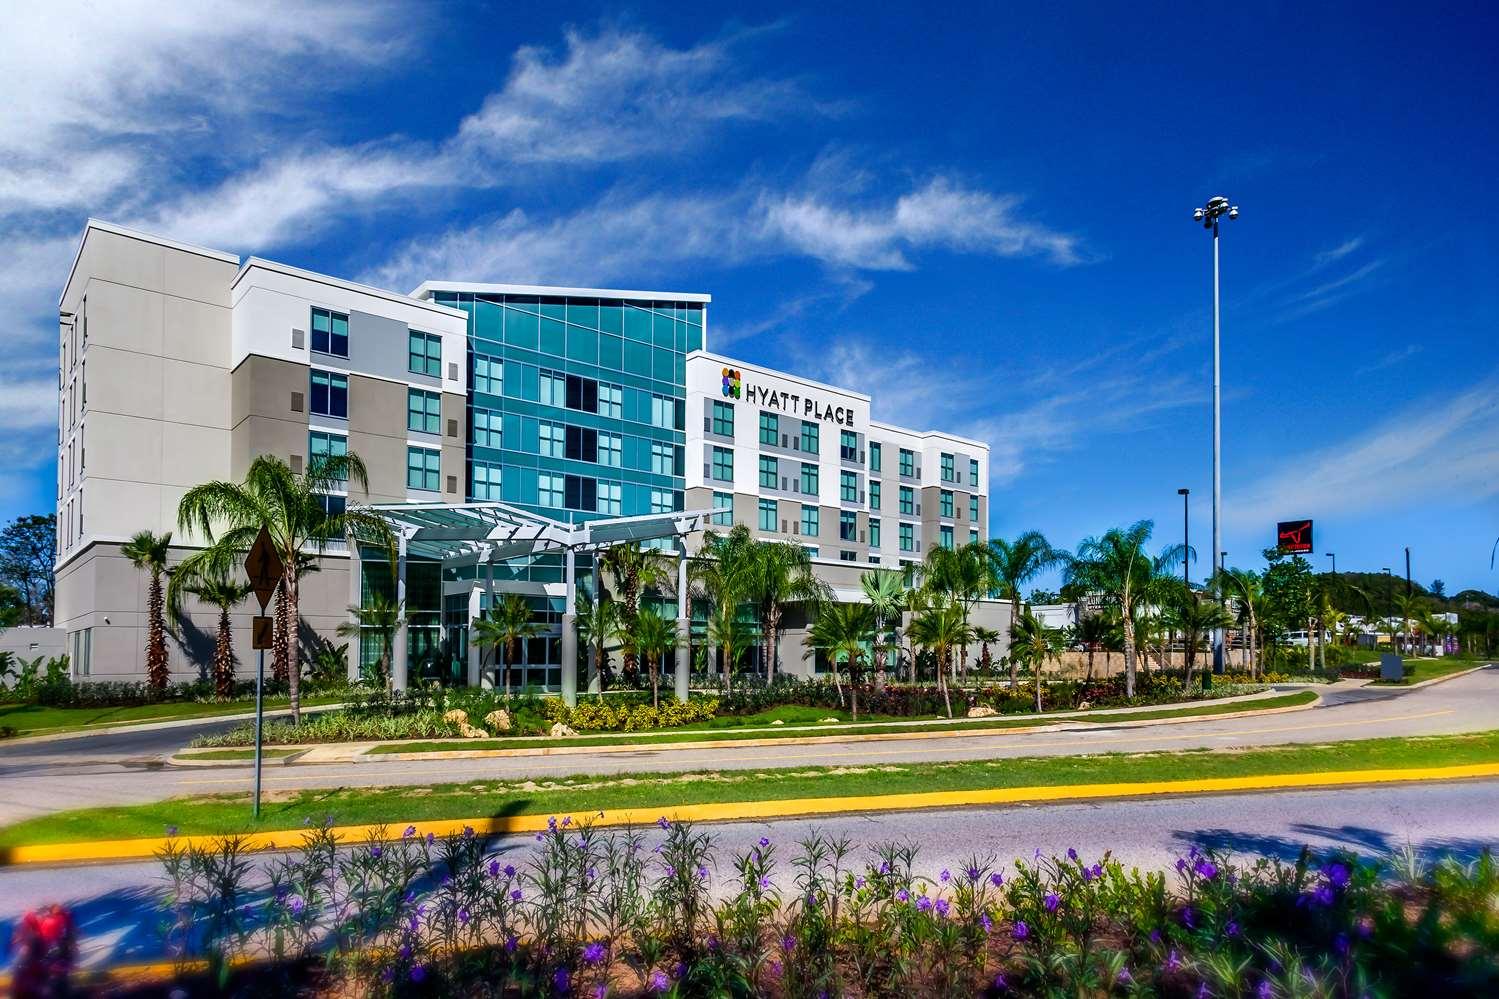 Exterior view - Hyatt Place Hotel Manati